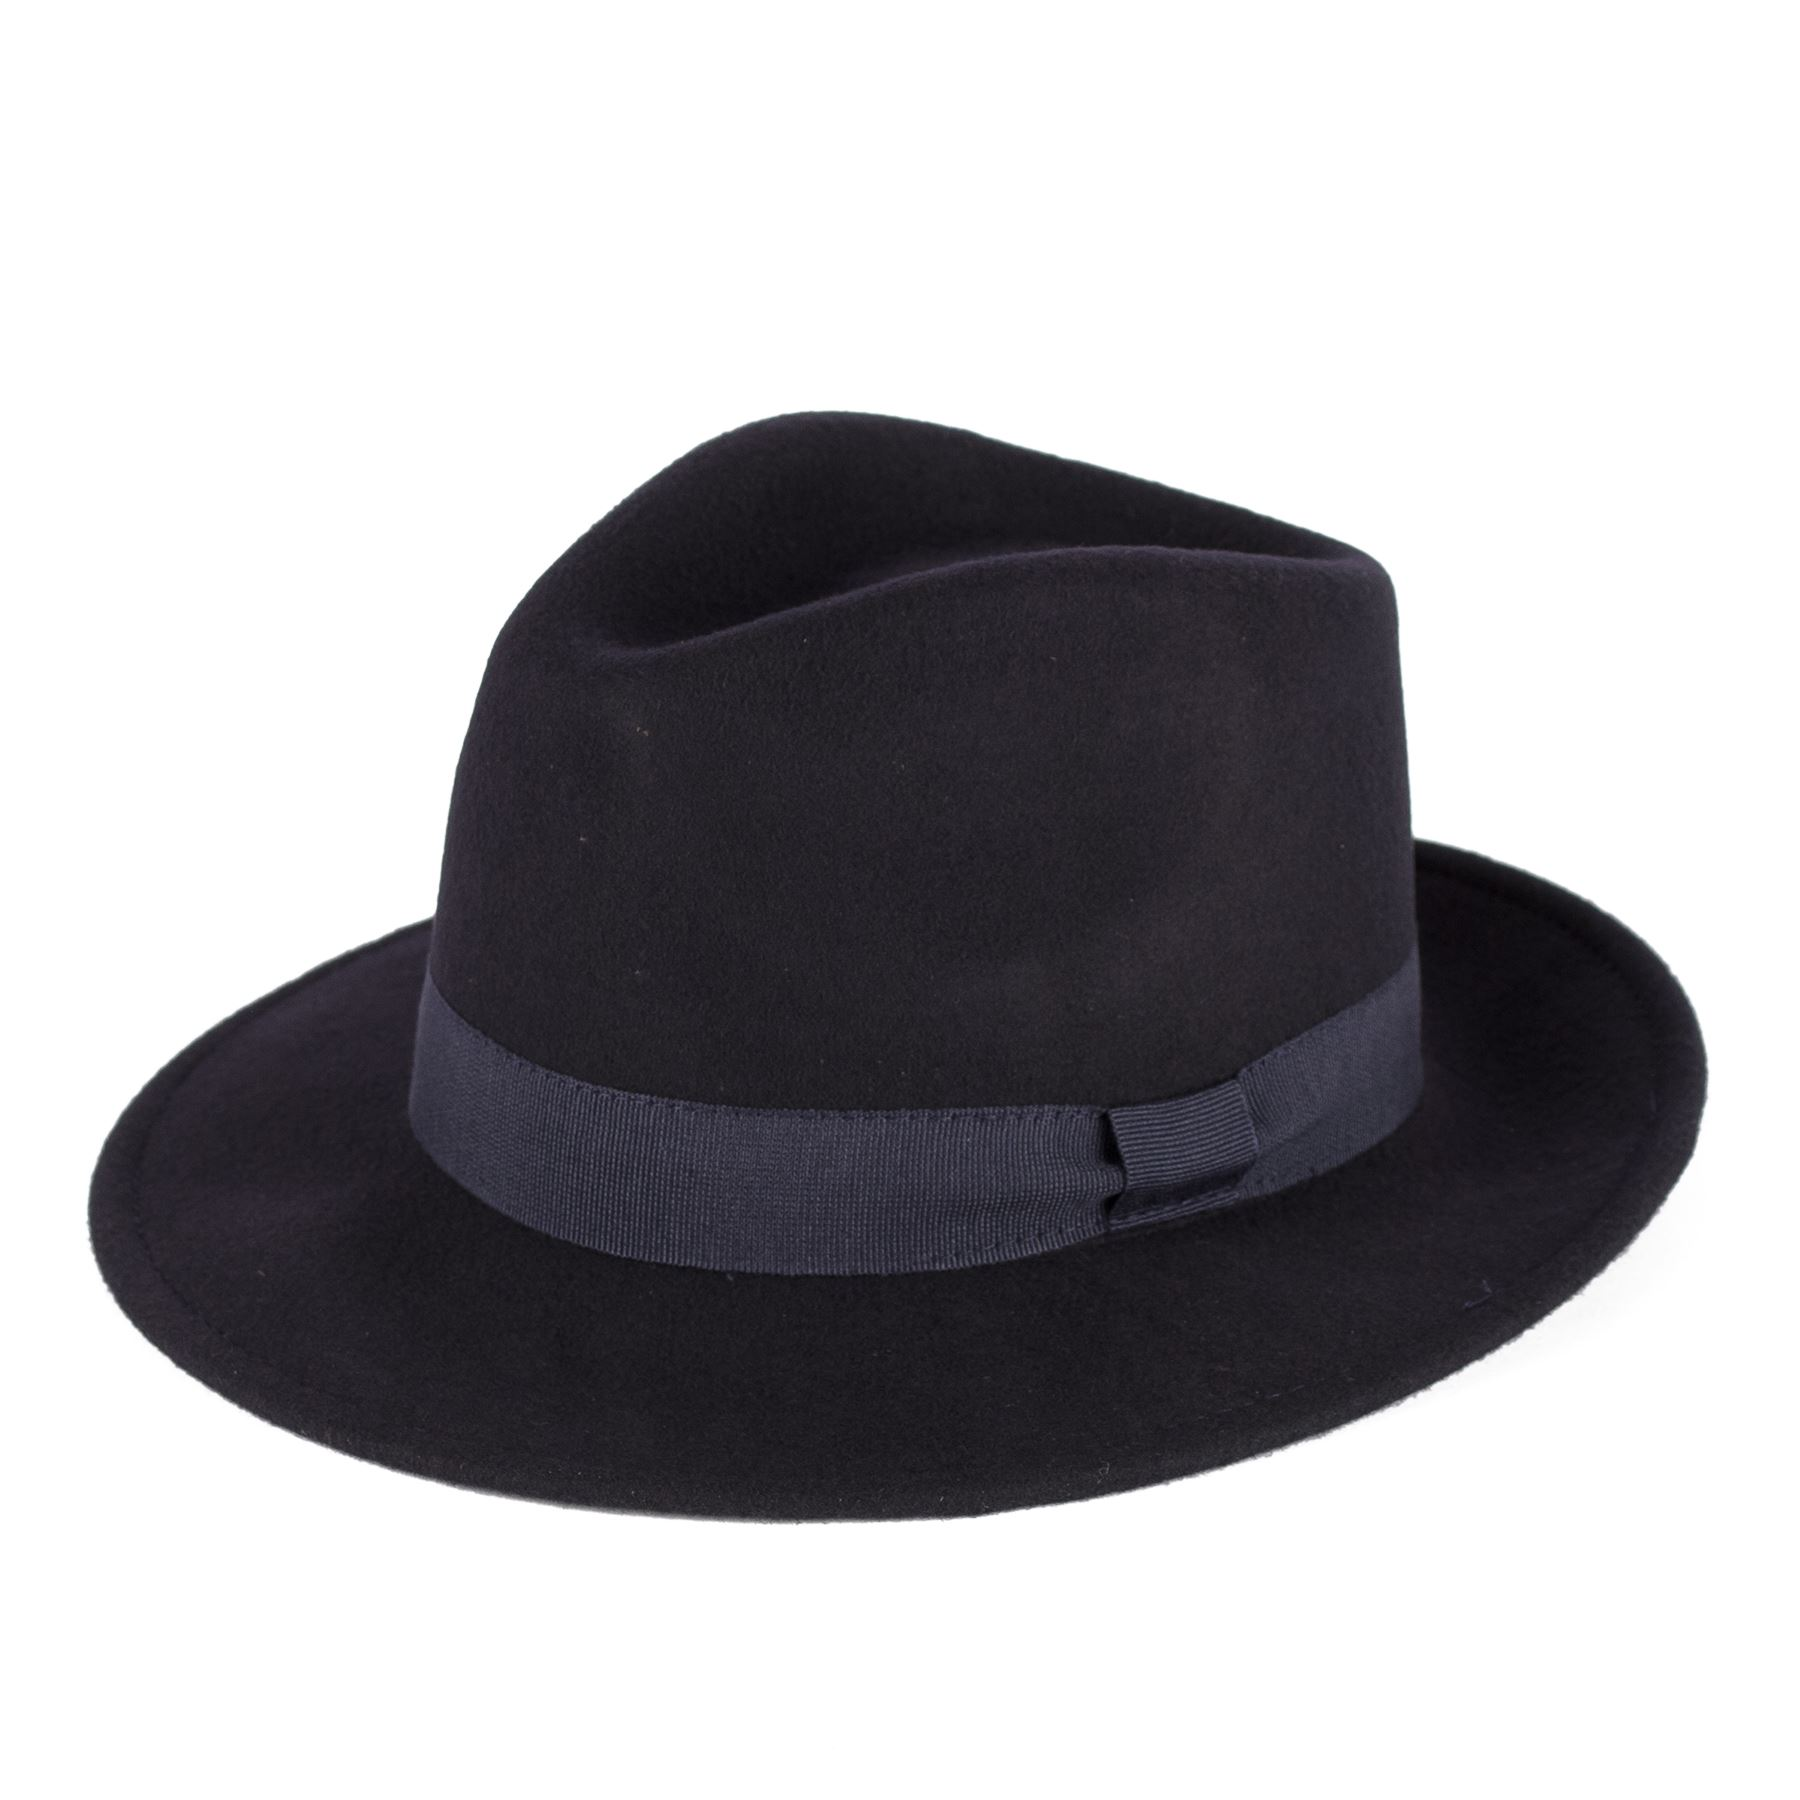 100 Wool Felt Fedora Hat With Grosgrain Band Handmade in Italy Navy ... cd6f82e40539